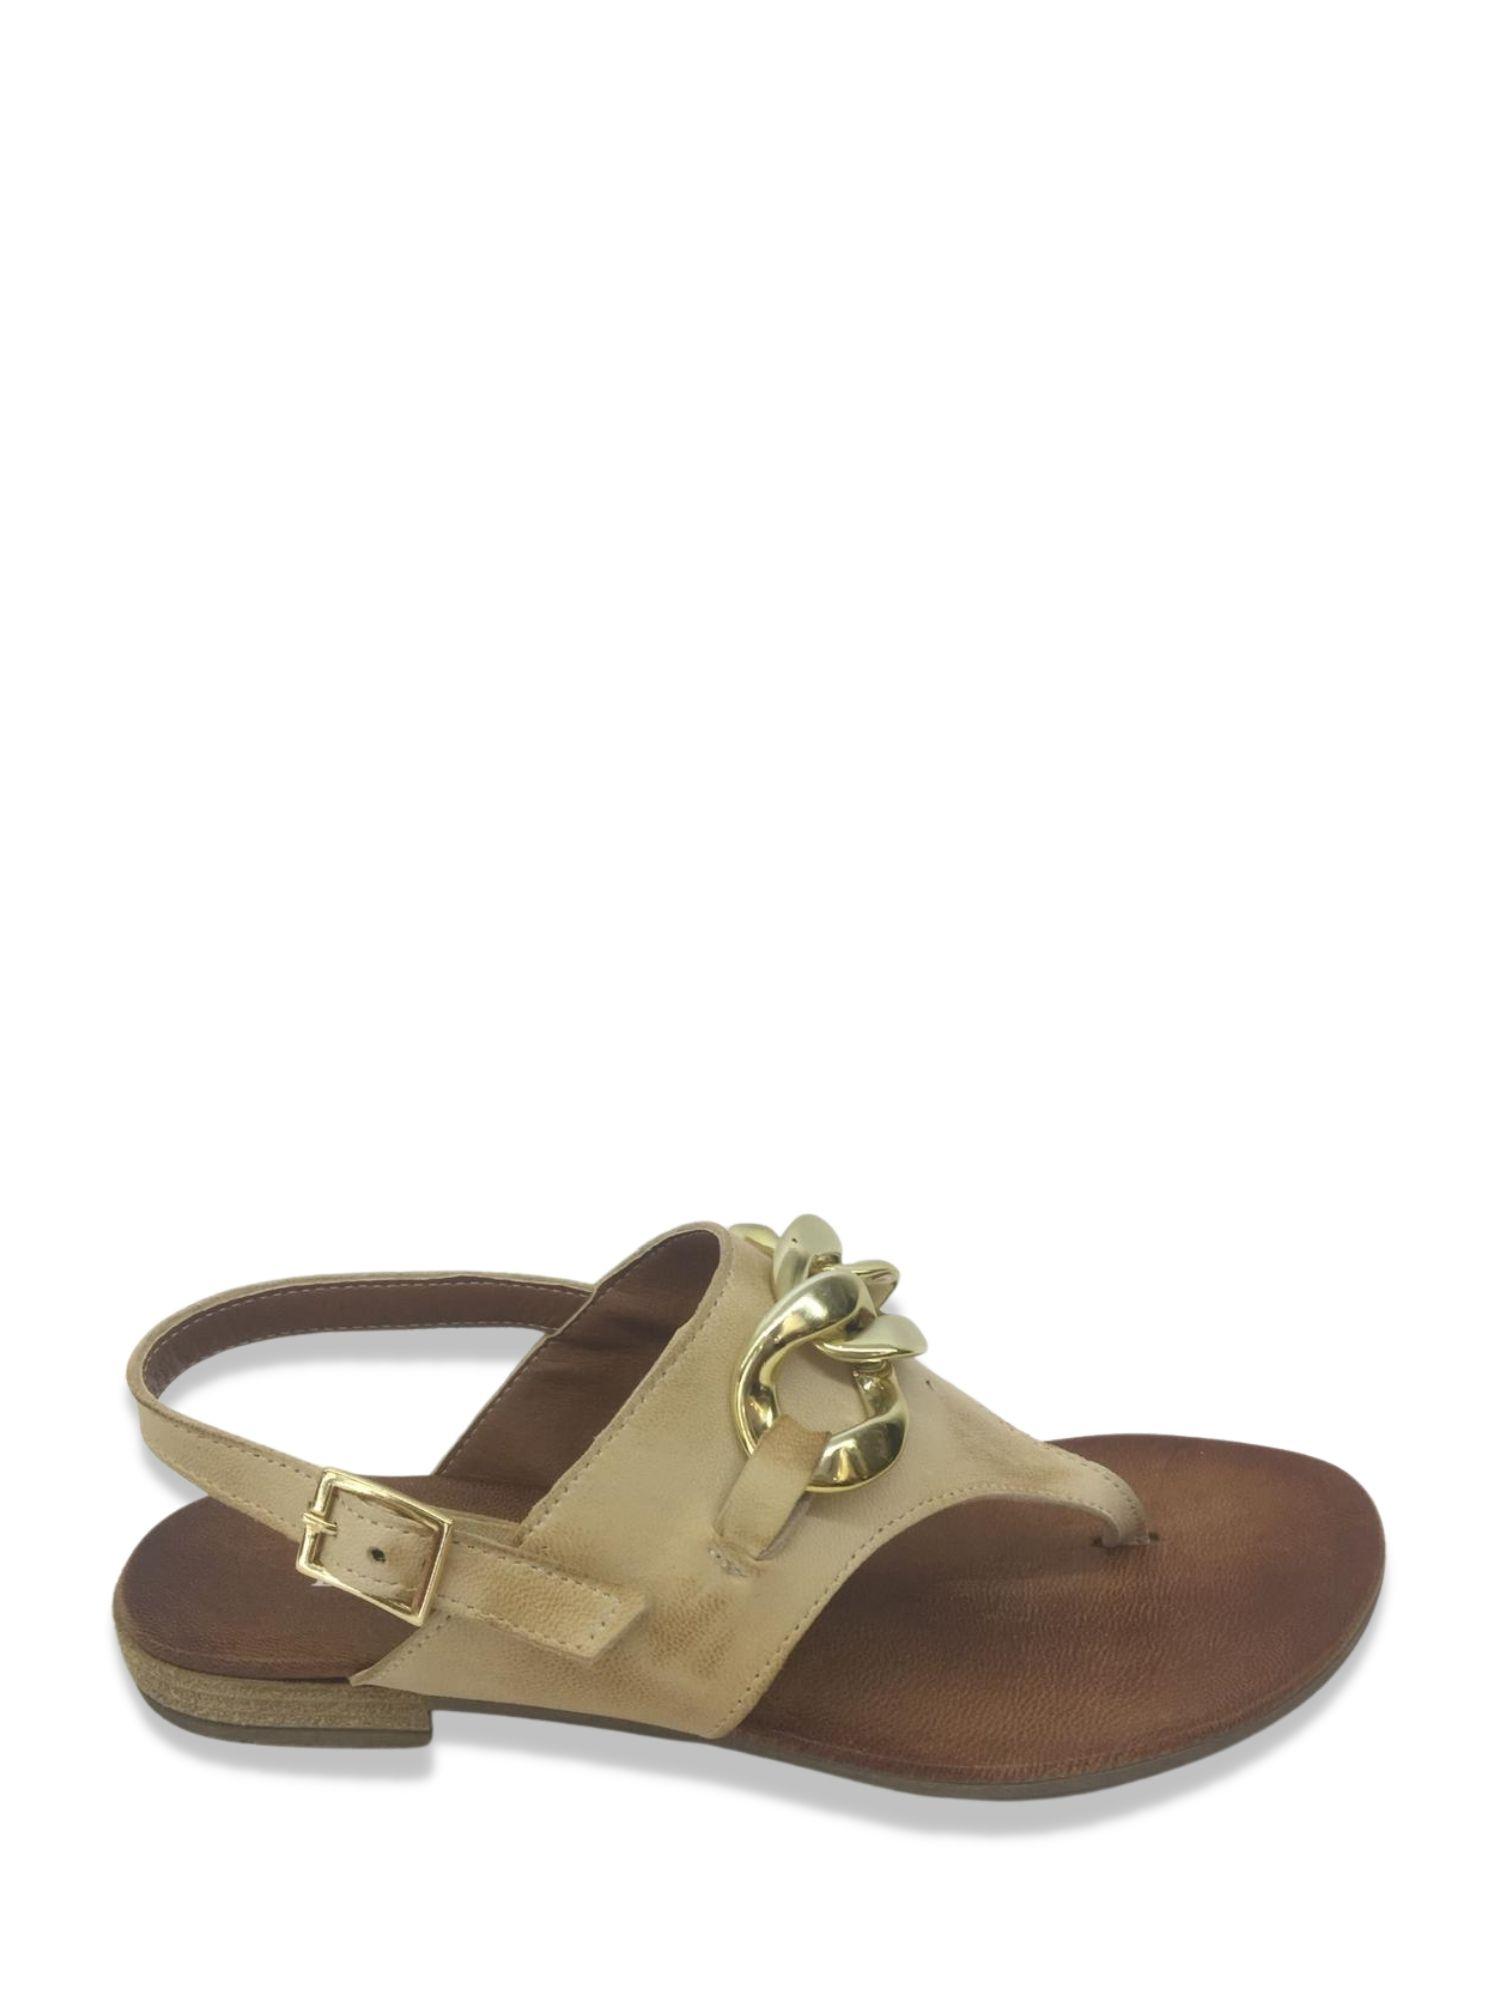 Sandalo infradito Made in Italy 203 Beige